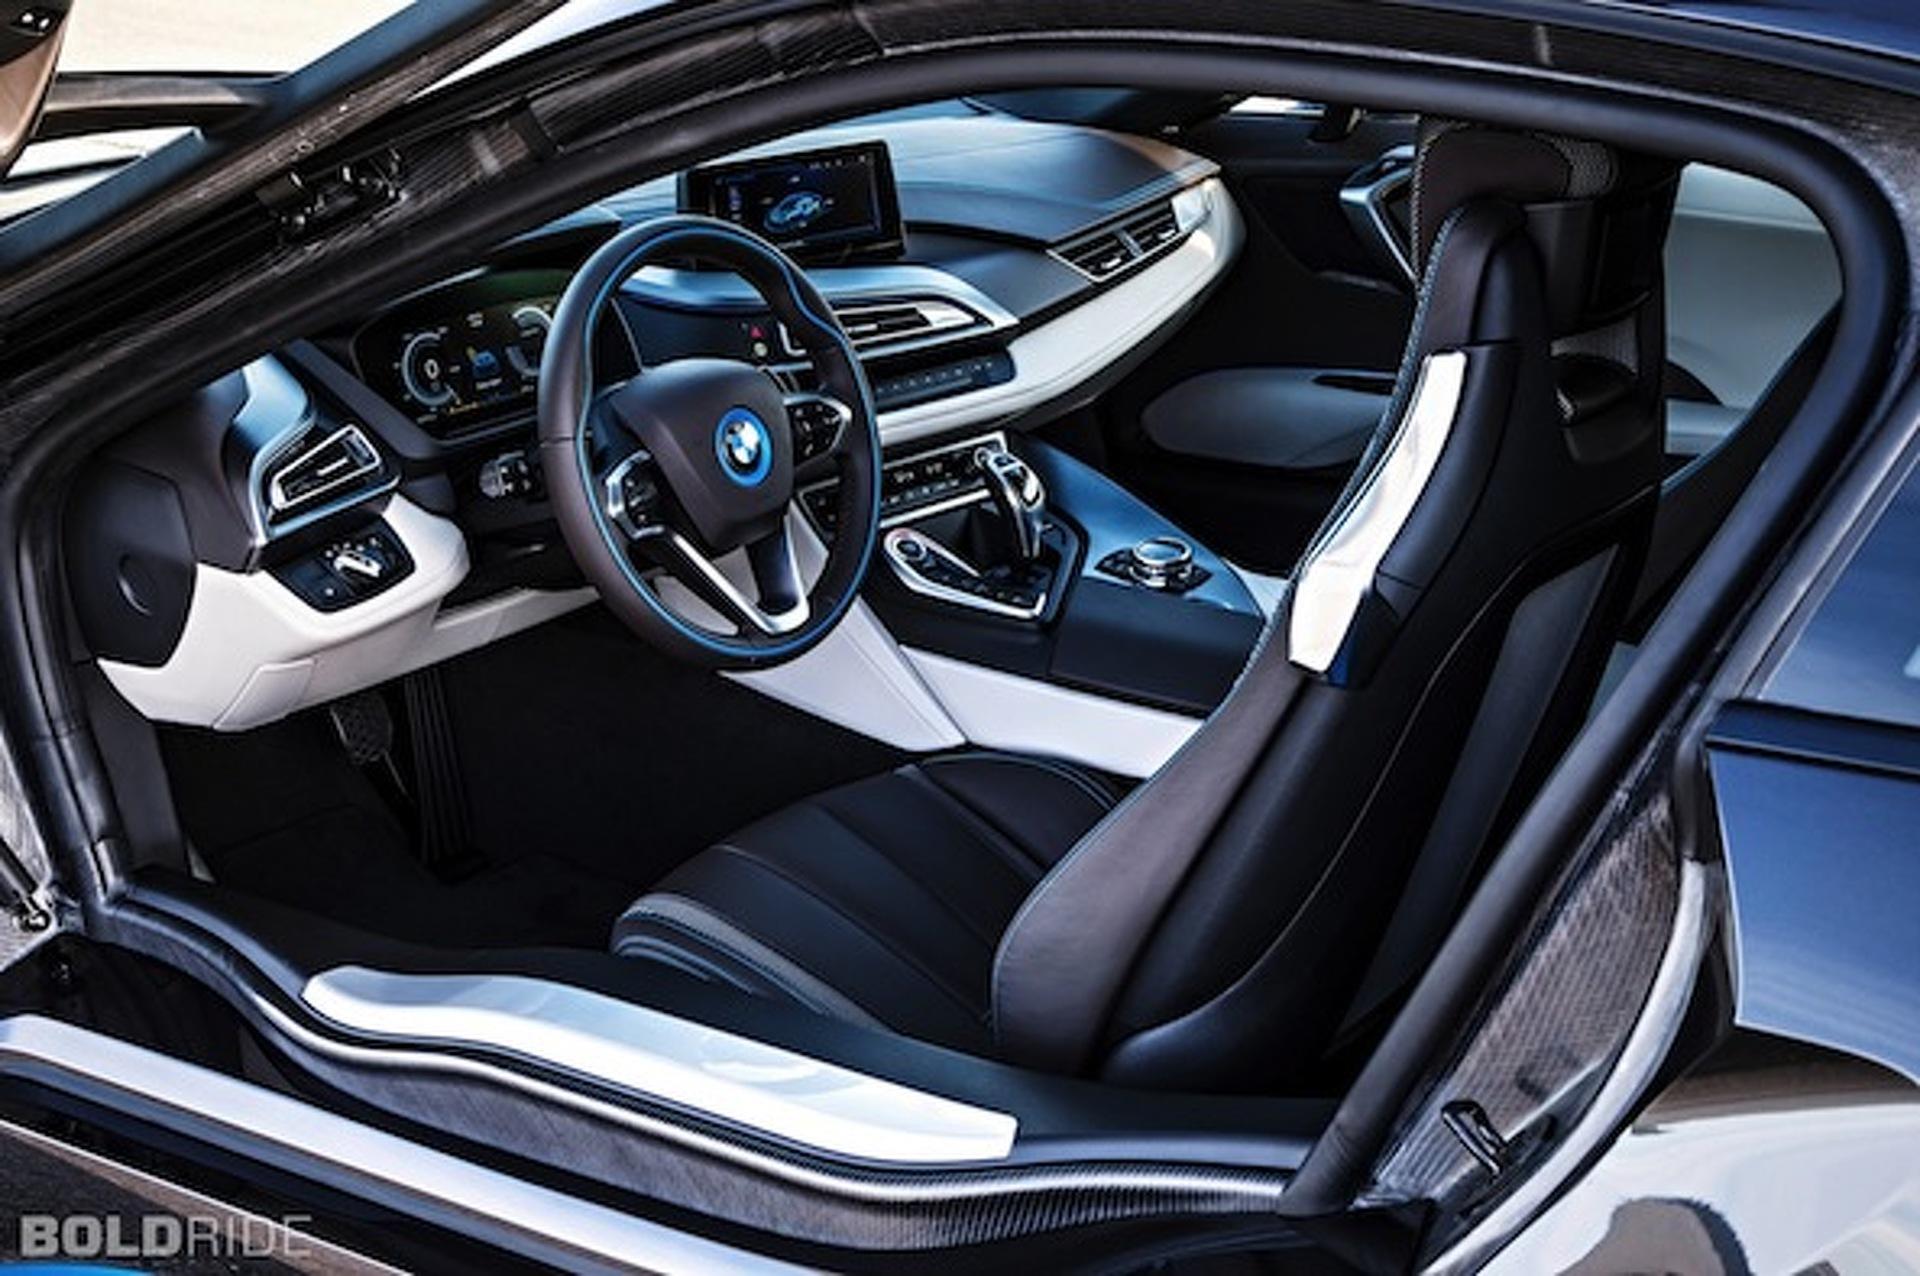 BMW i8 Electric Sportscar Makes World Debut [w/video]